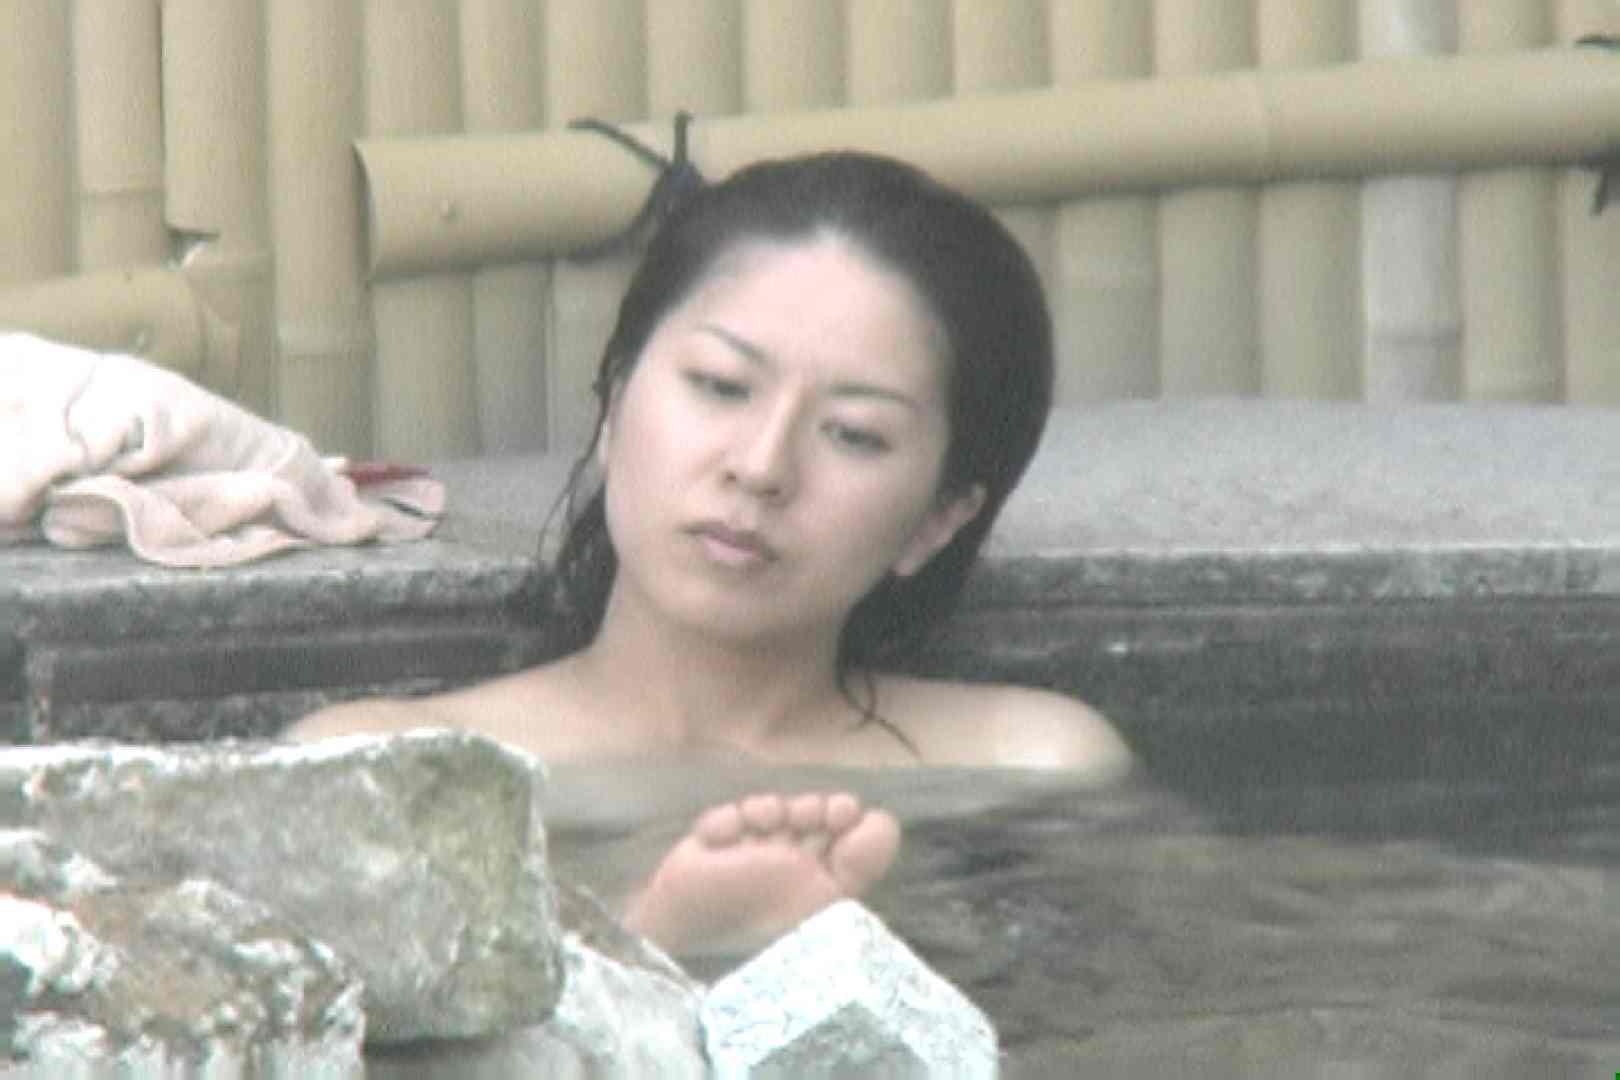 Aquaな露天風呂Vol.694 盗撮 AV無料 67画像 62